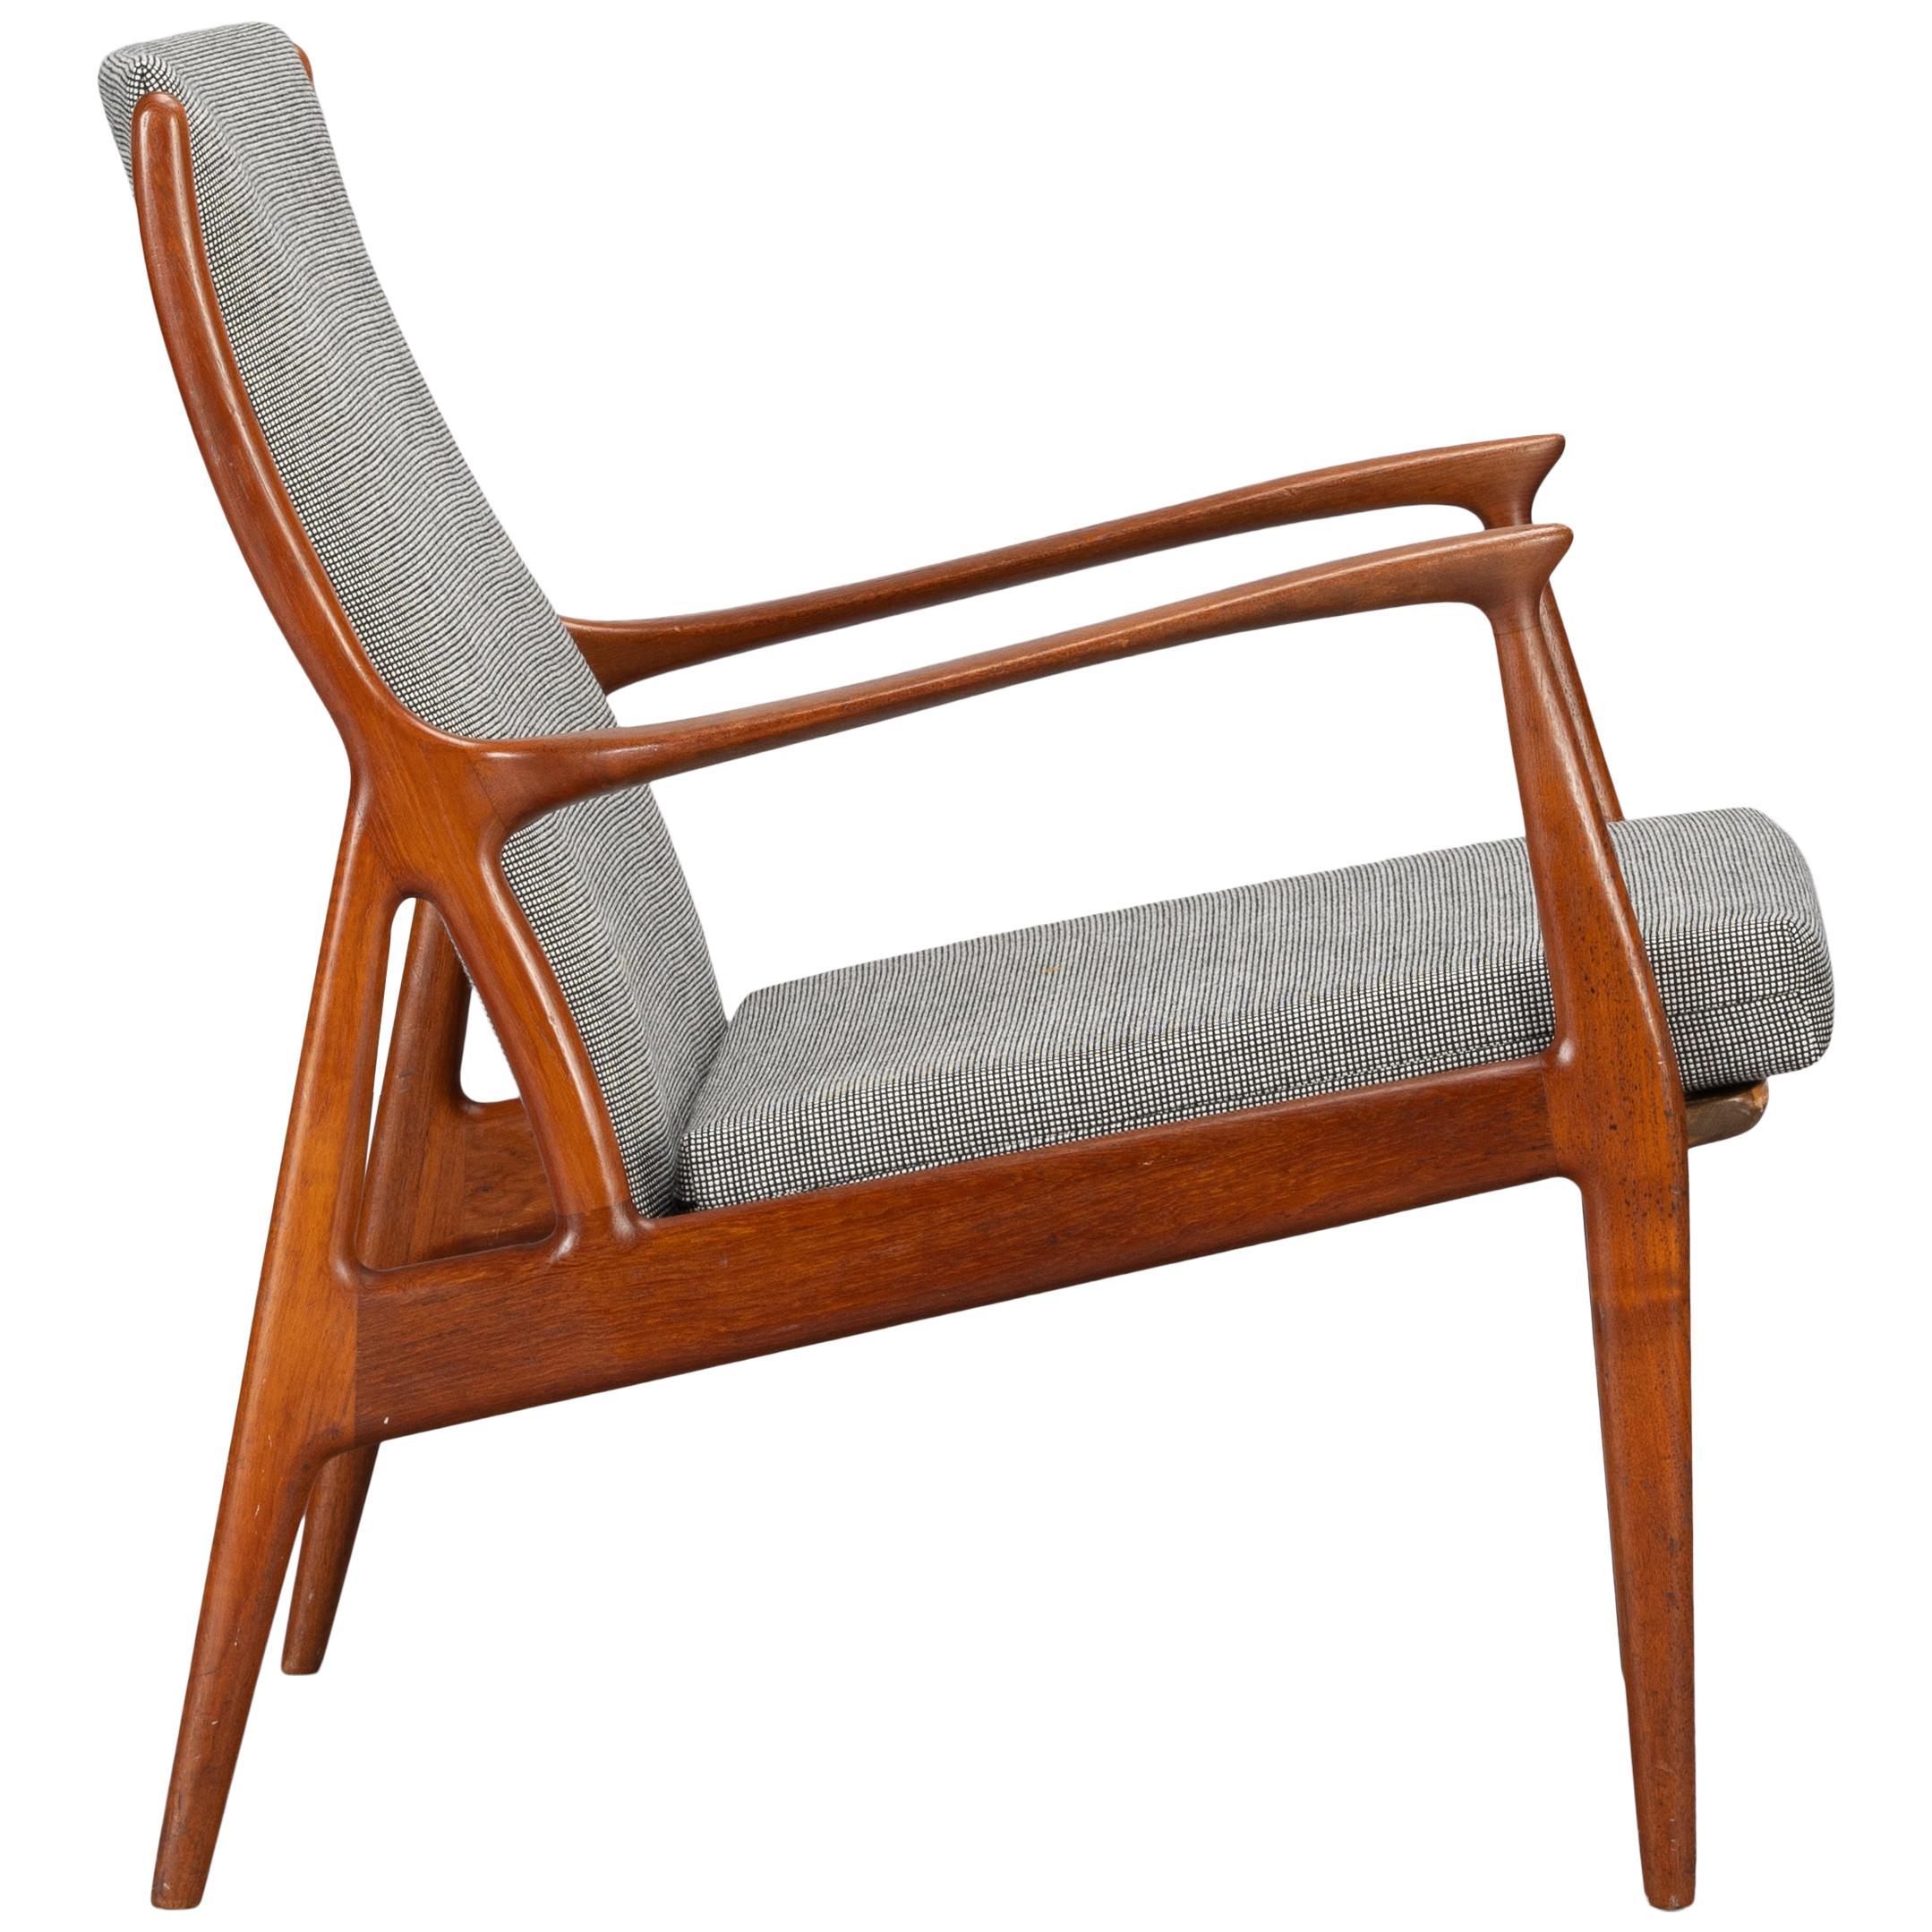 Stunning Reupholstered Teak Lounge Chair by Erik Andersen and Palle Pedersen